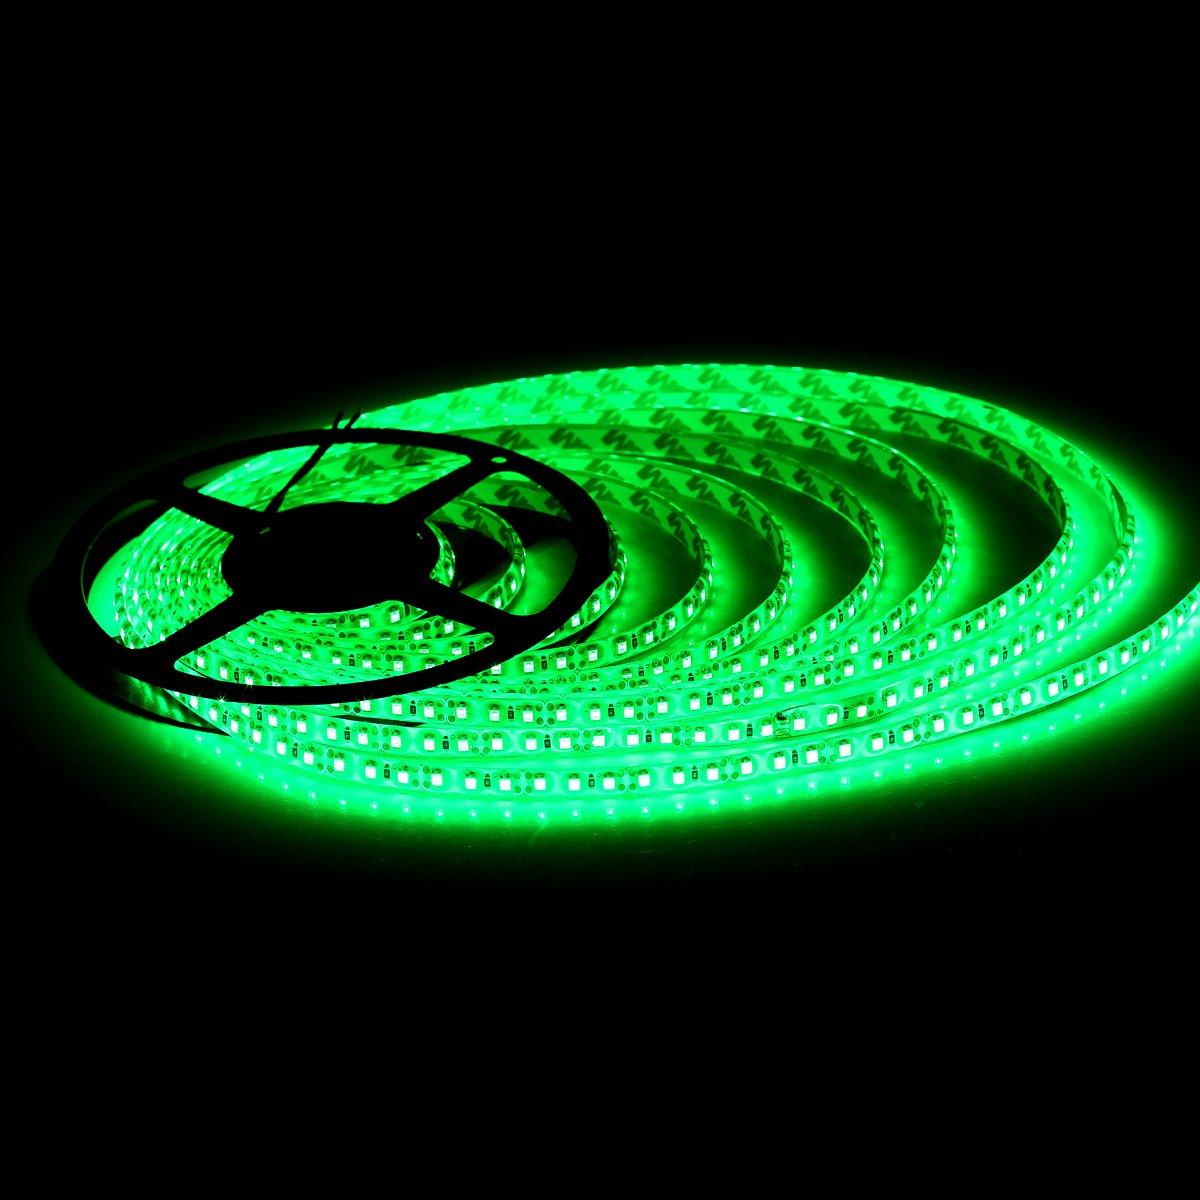 SUPERNIGHT High Density Green Waterproof Led Light Strip, SMD 3528, 5 Meter or 16 Ft LED Strip 120 Leds/M by SUPERNIGHT (Image #4)